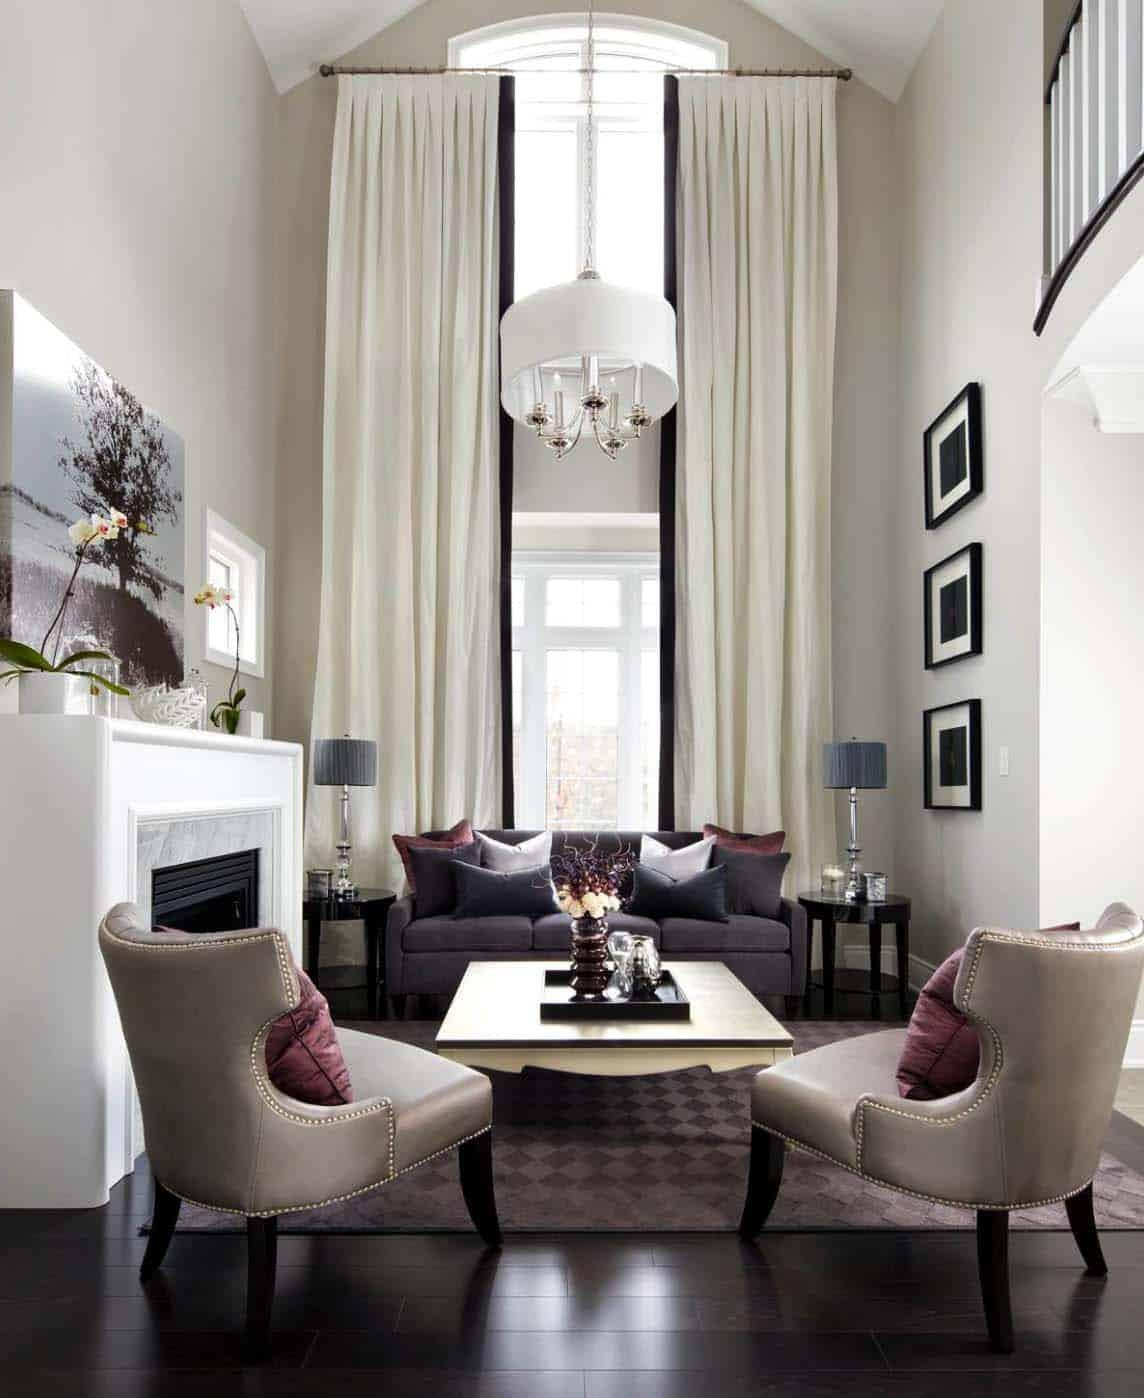 modern elegant living room designs flooring for and kitchen 38 rooms that are brilliantly designed 37 1 kindesign